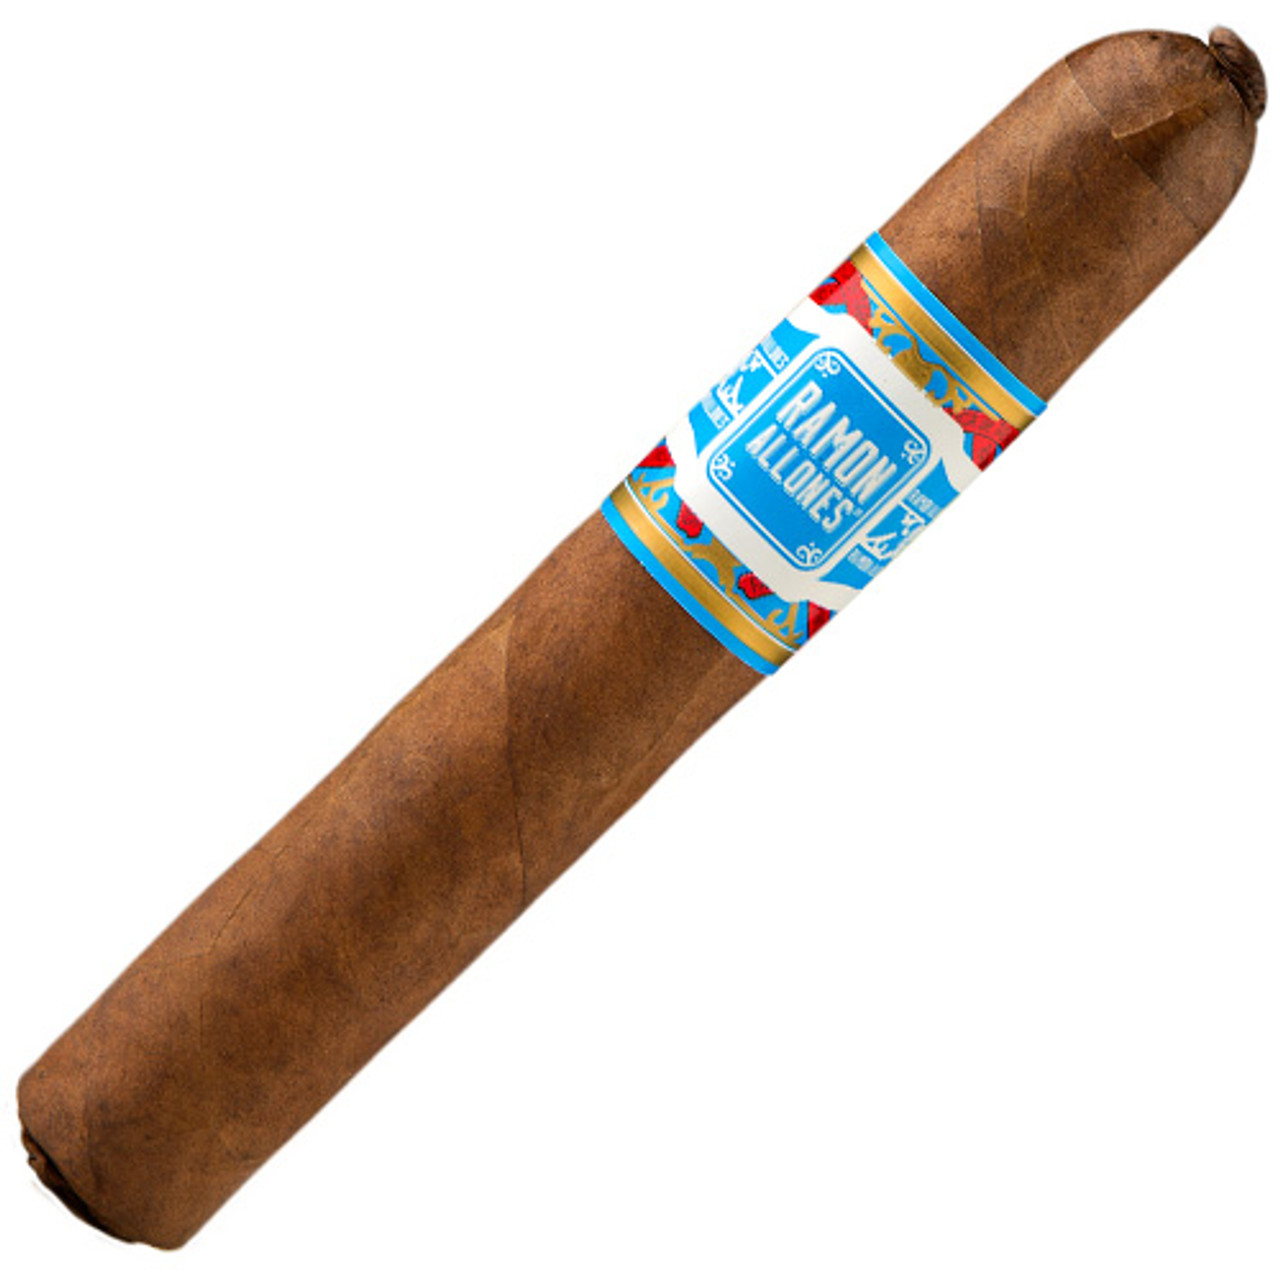 Ramon Allones Heritage 6560 Cigars - 6.5 x 60 (Box of 20)